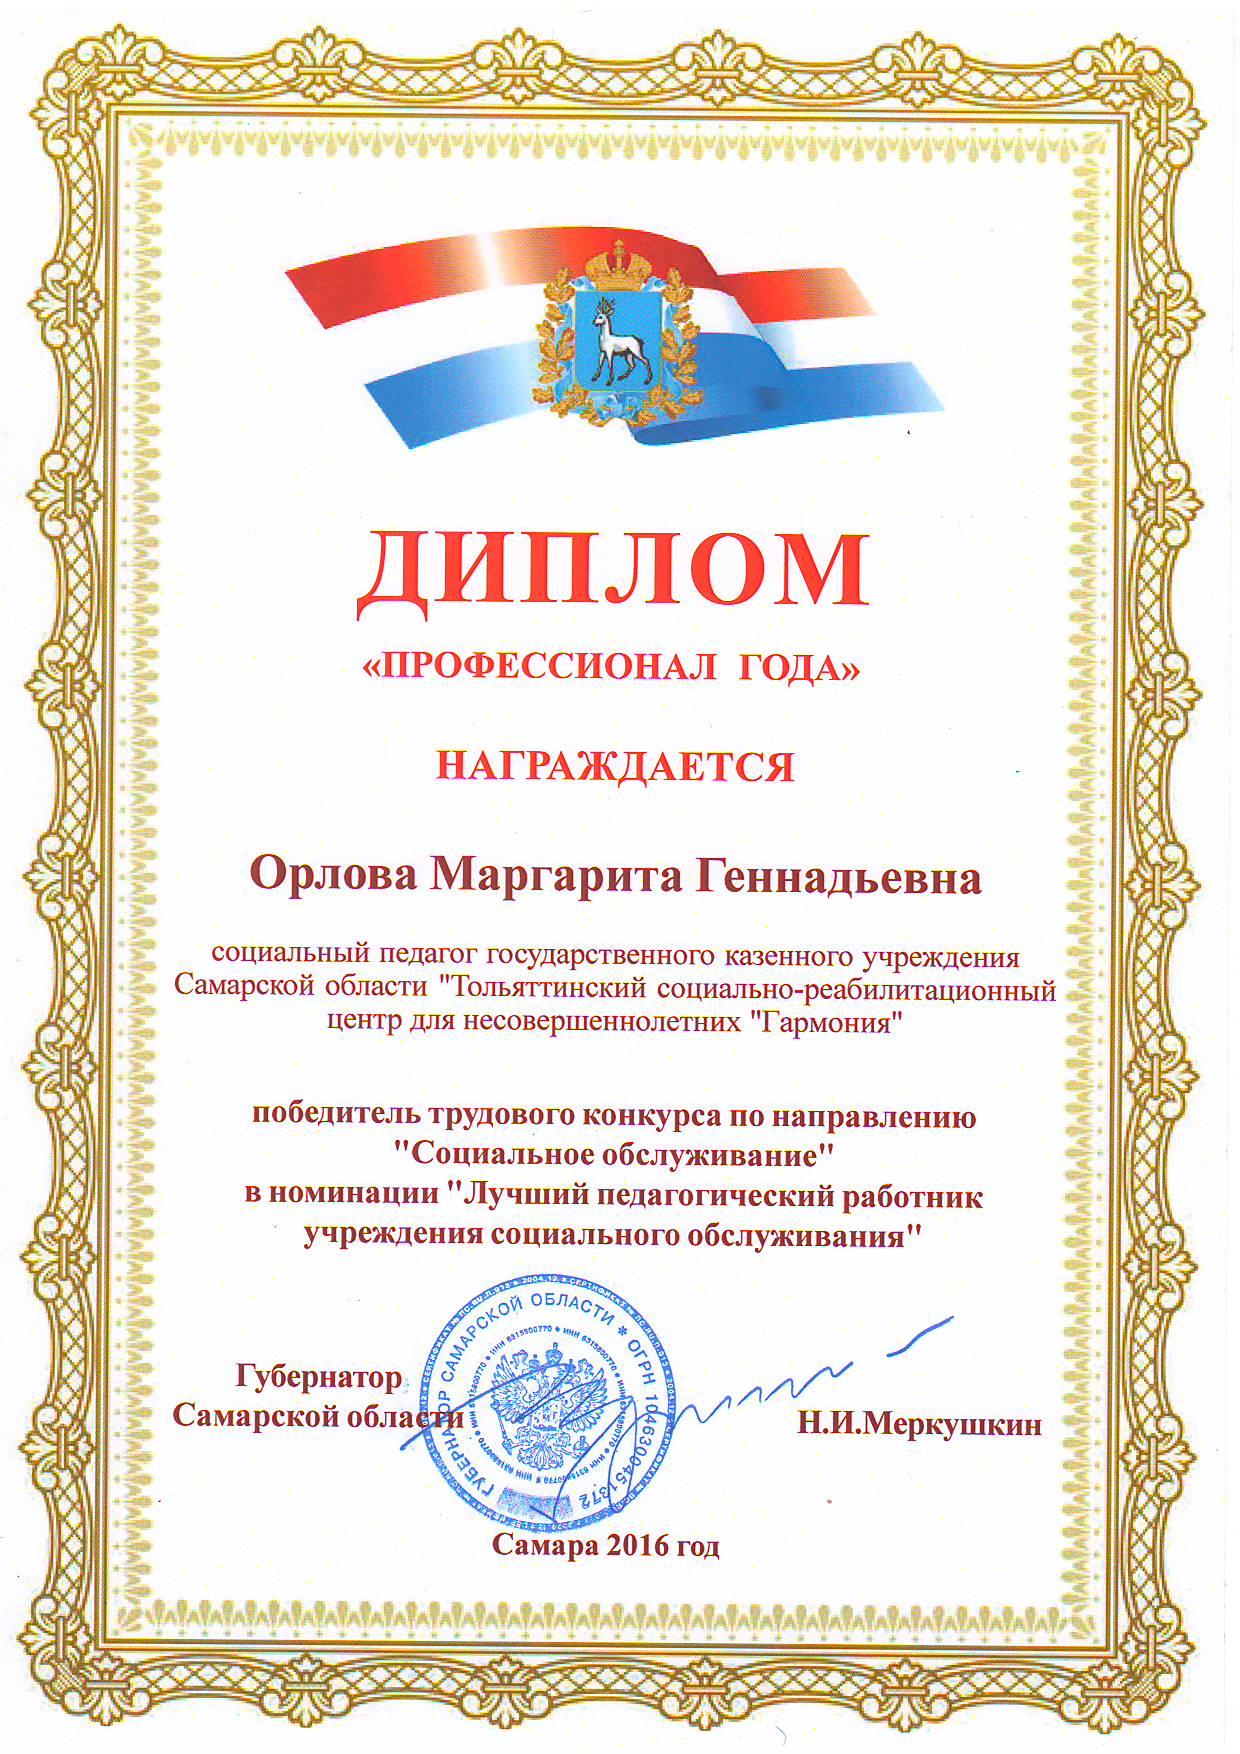 Орлова Маргарита Геннадьевна1